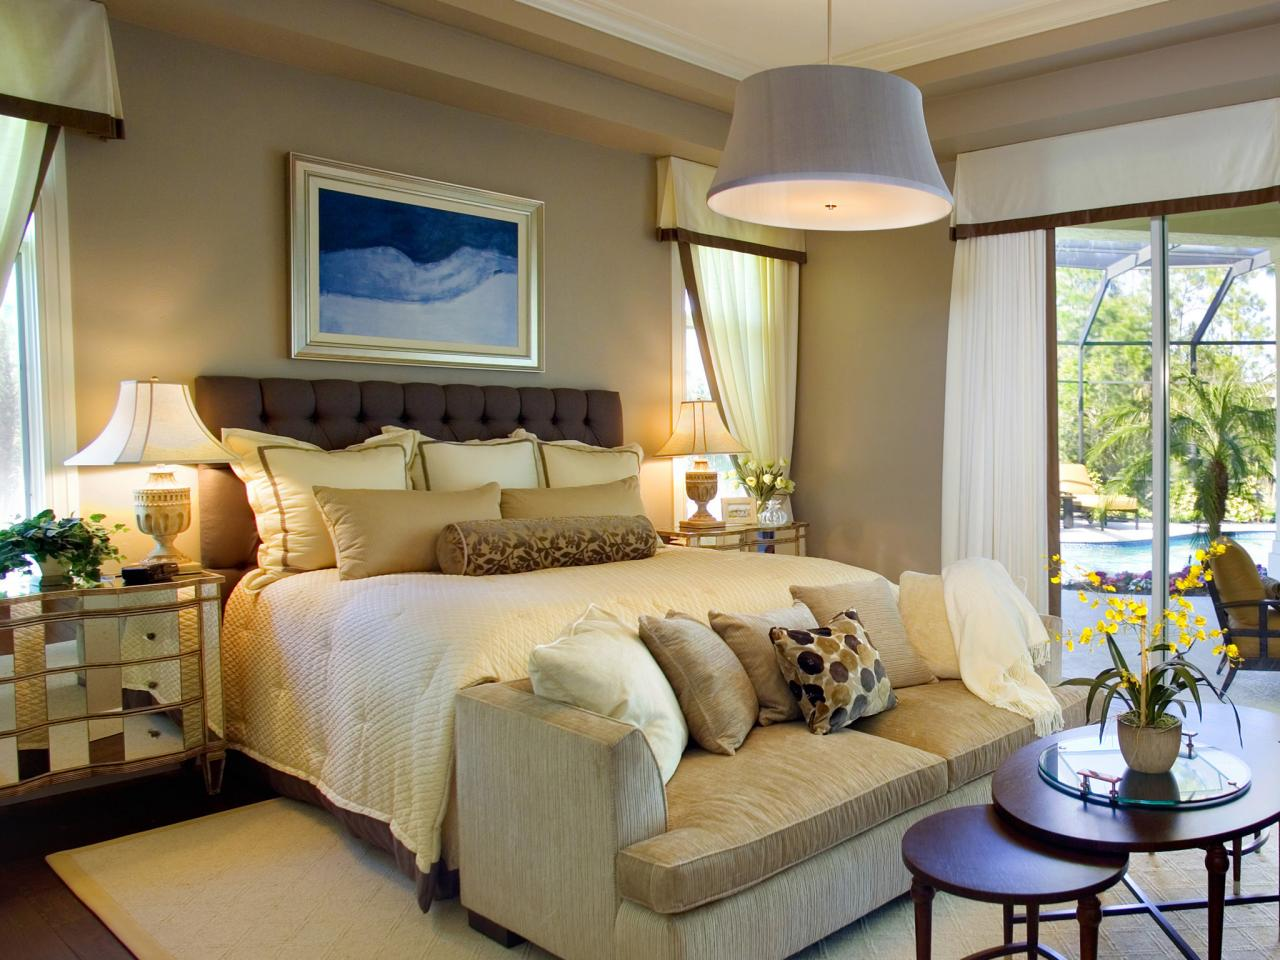 Bedroom Paint Color Ideas Captivating Bedroom Paint Ideas